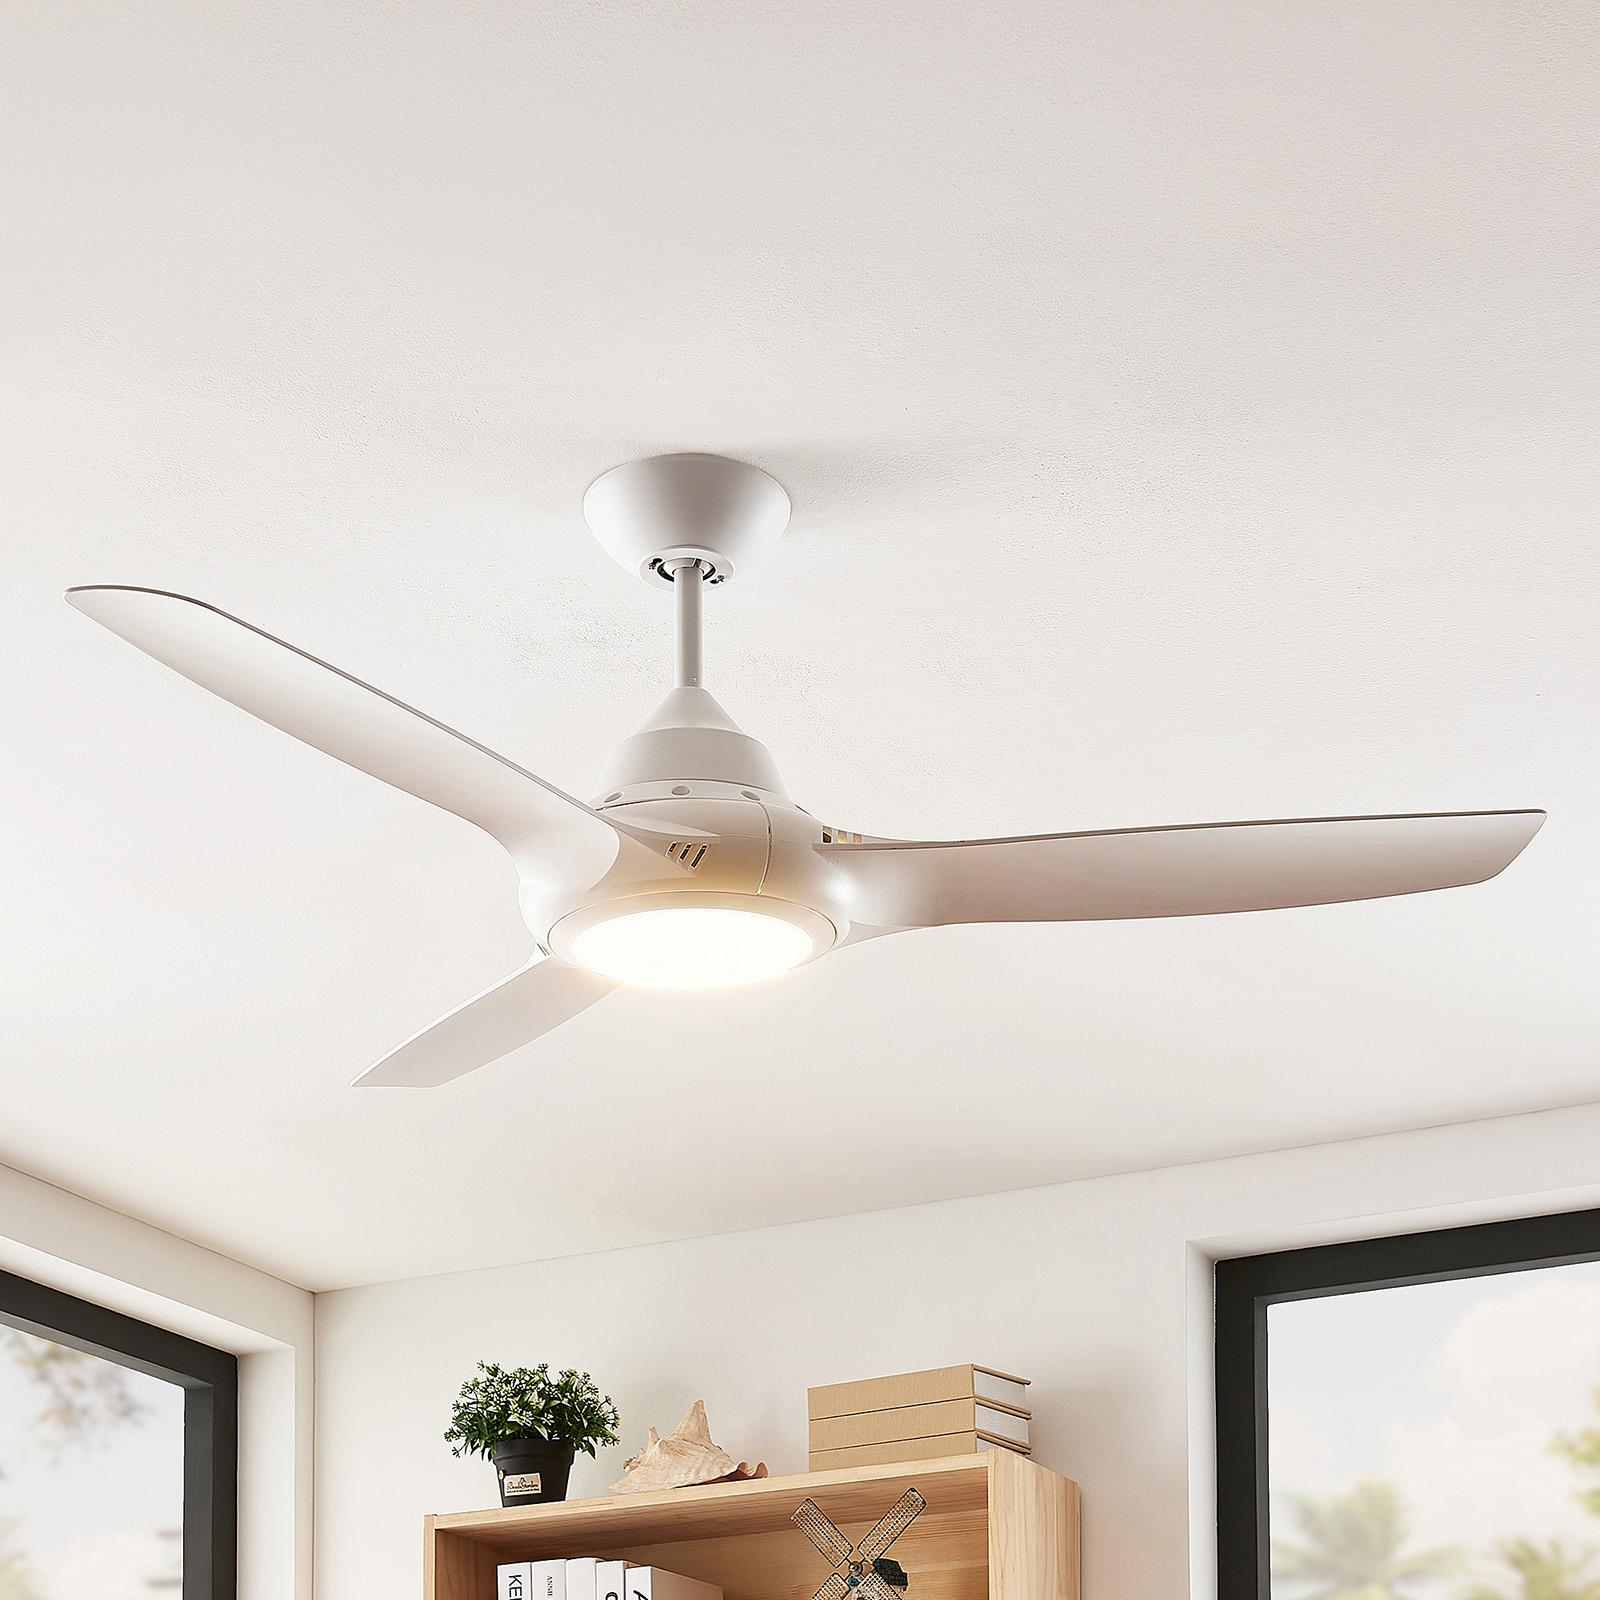 Arcchio Aila LED-loftventilator, 3 vinger, hvid